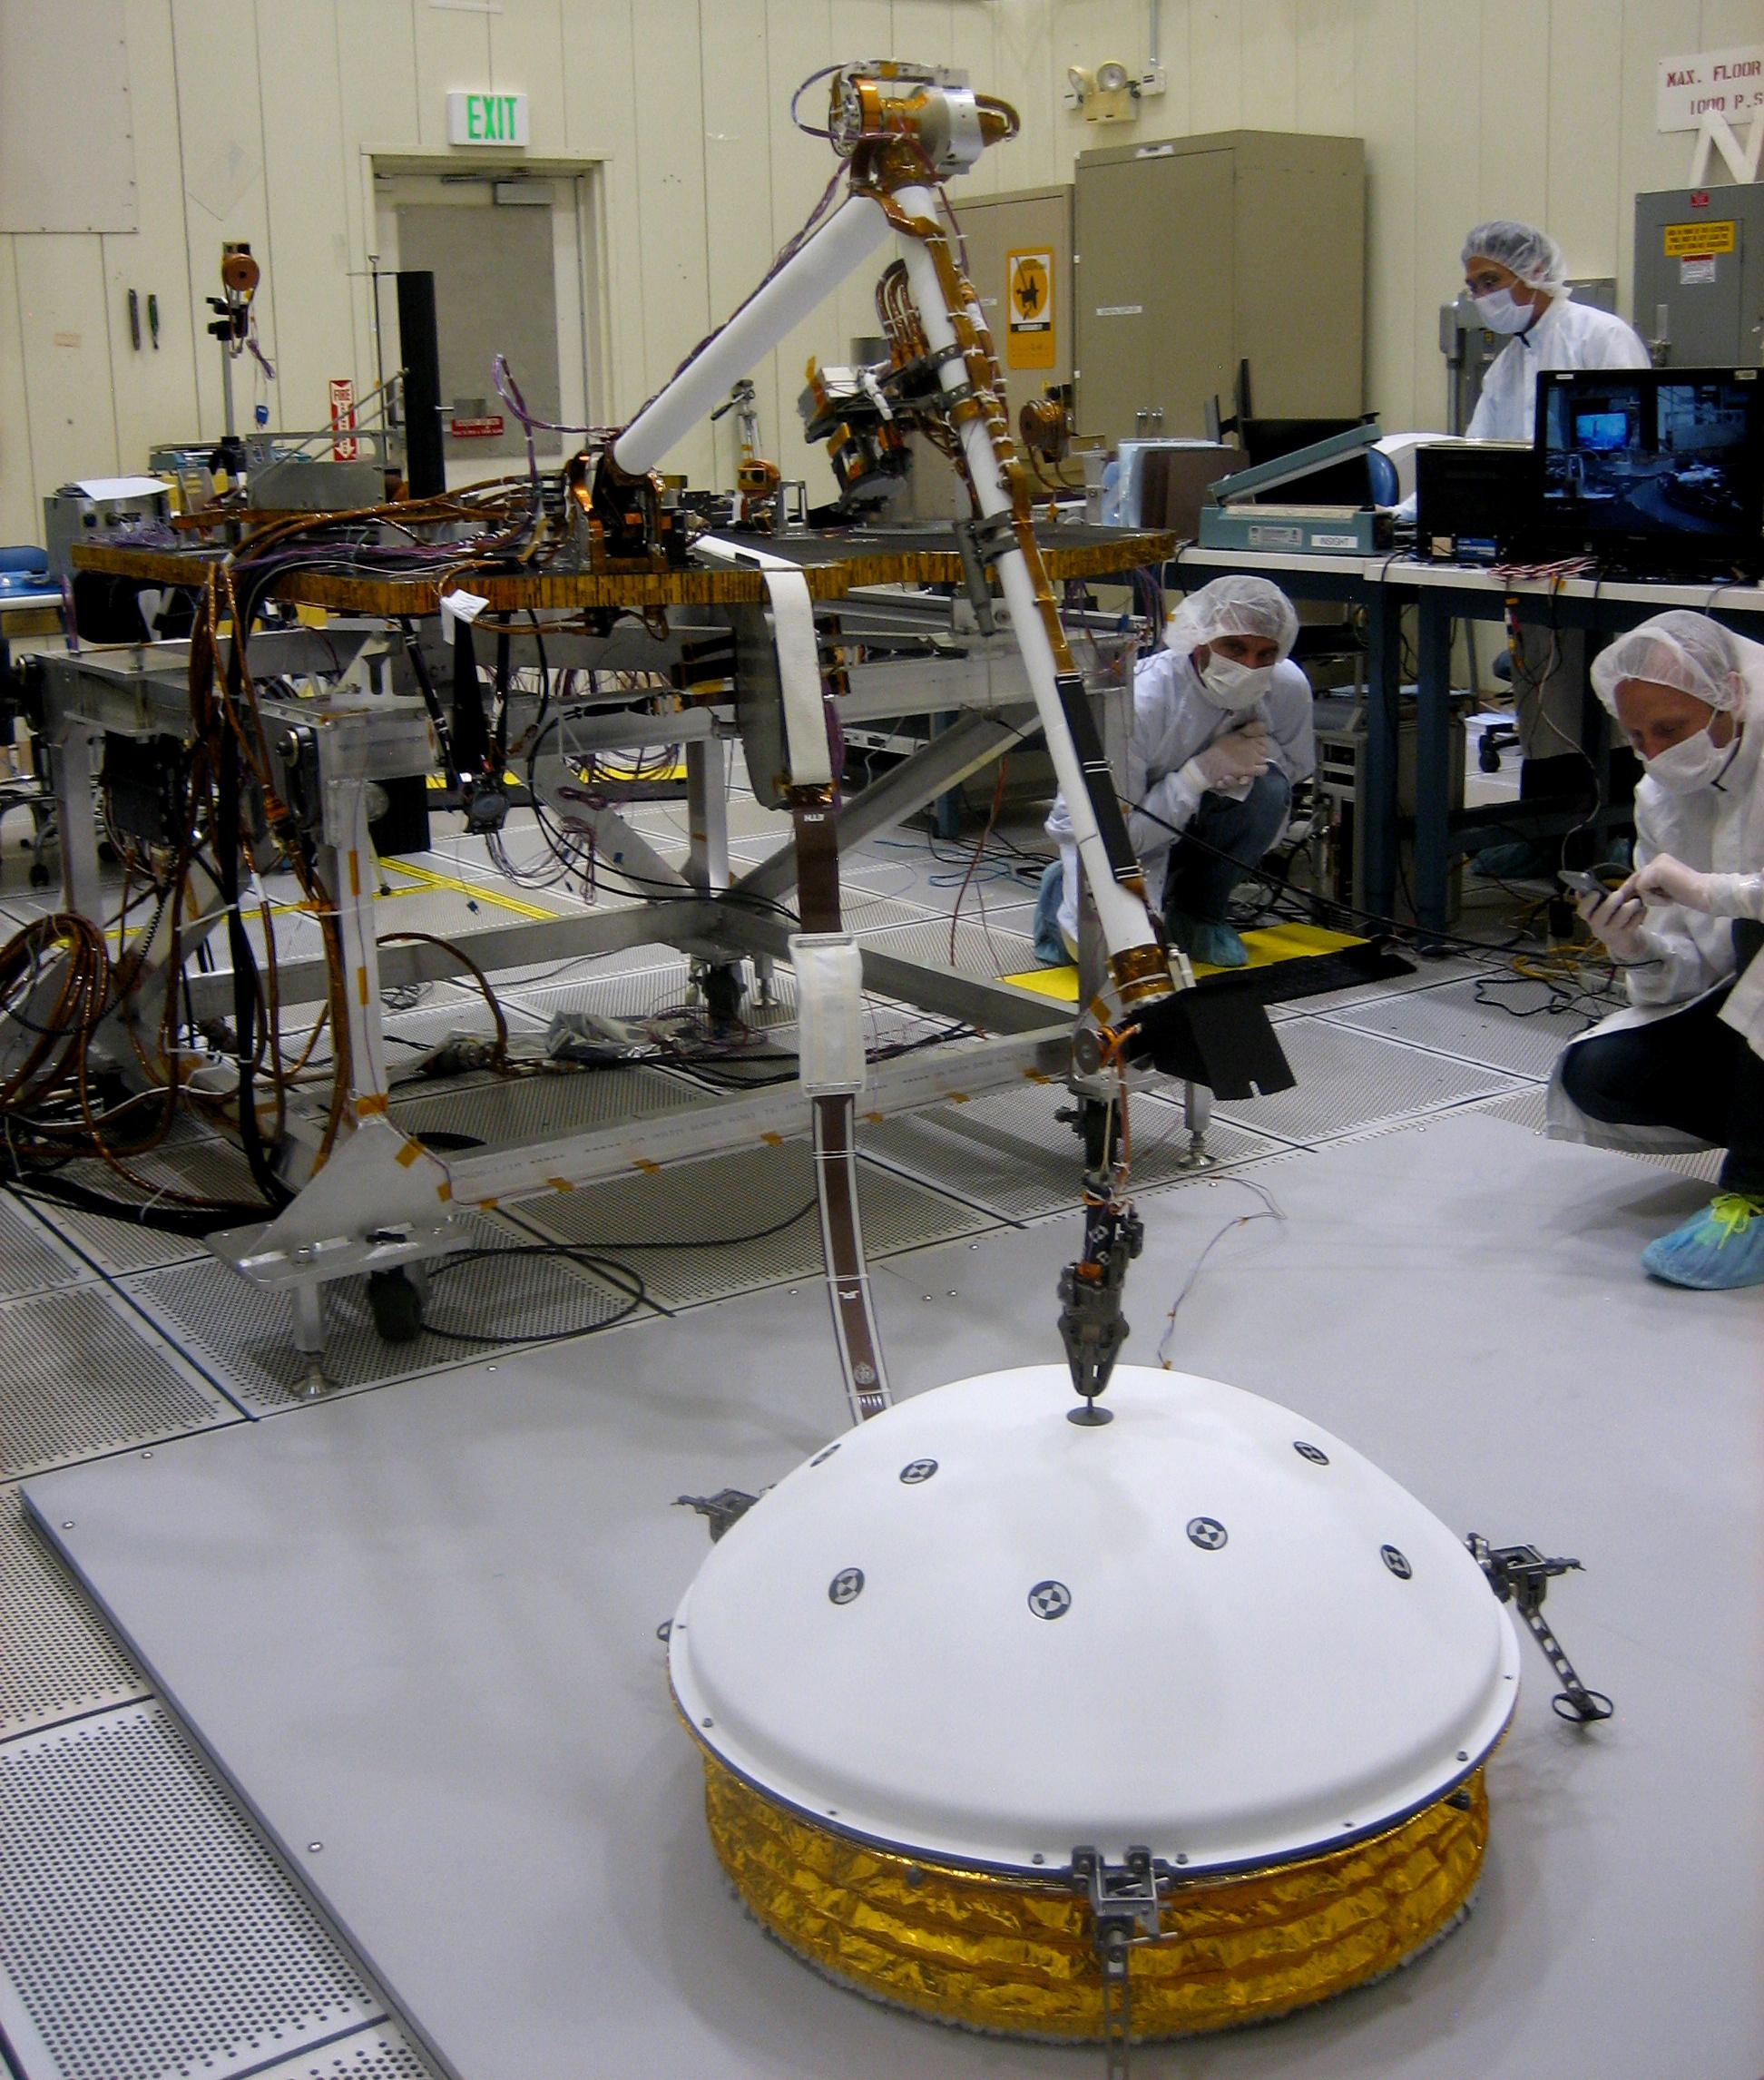 Single Site on Mars Advanced for 2016 NASA Lander